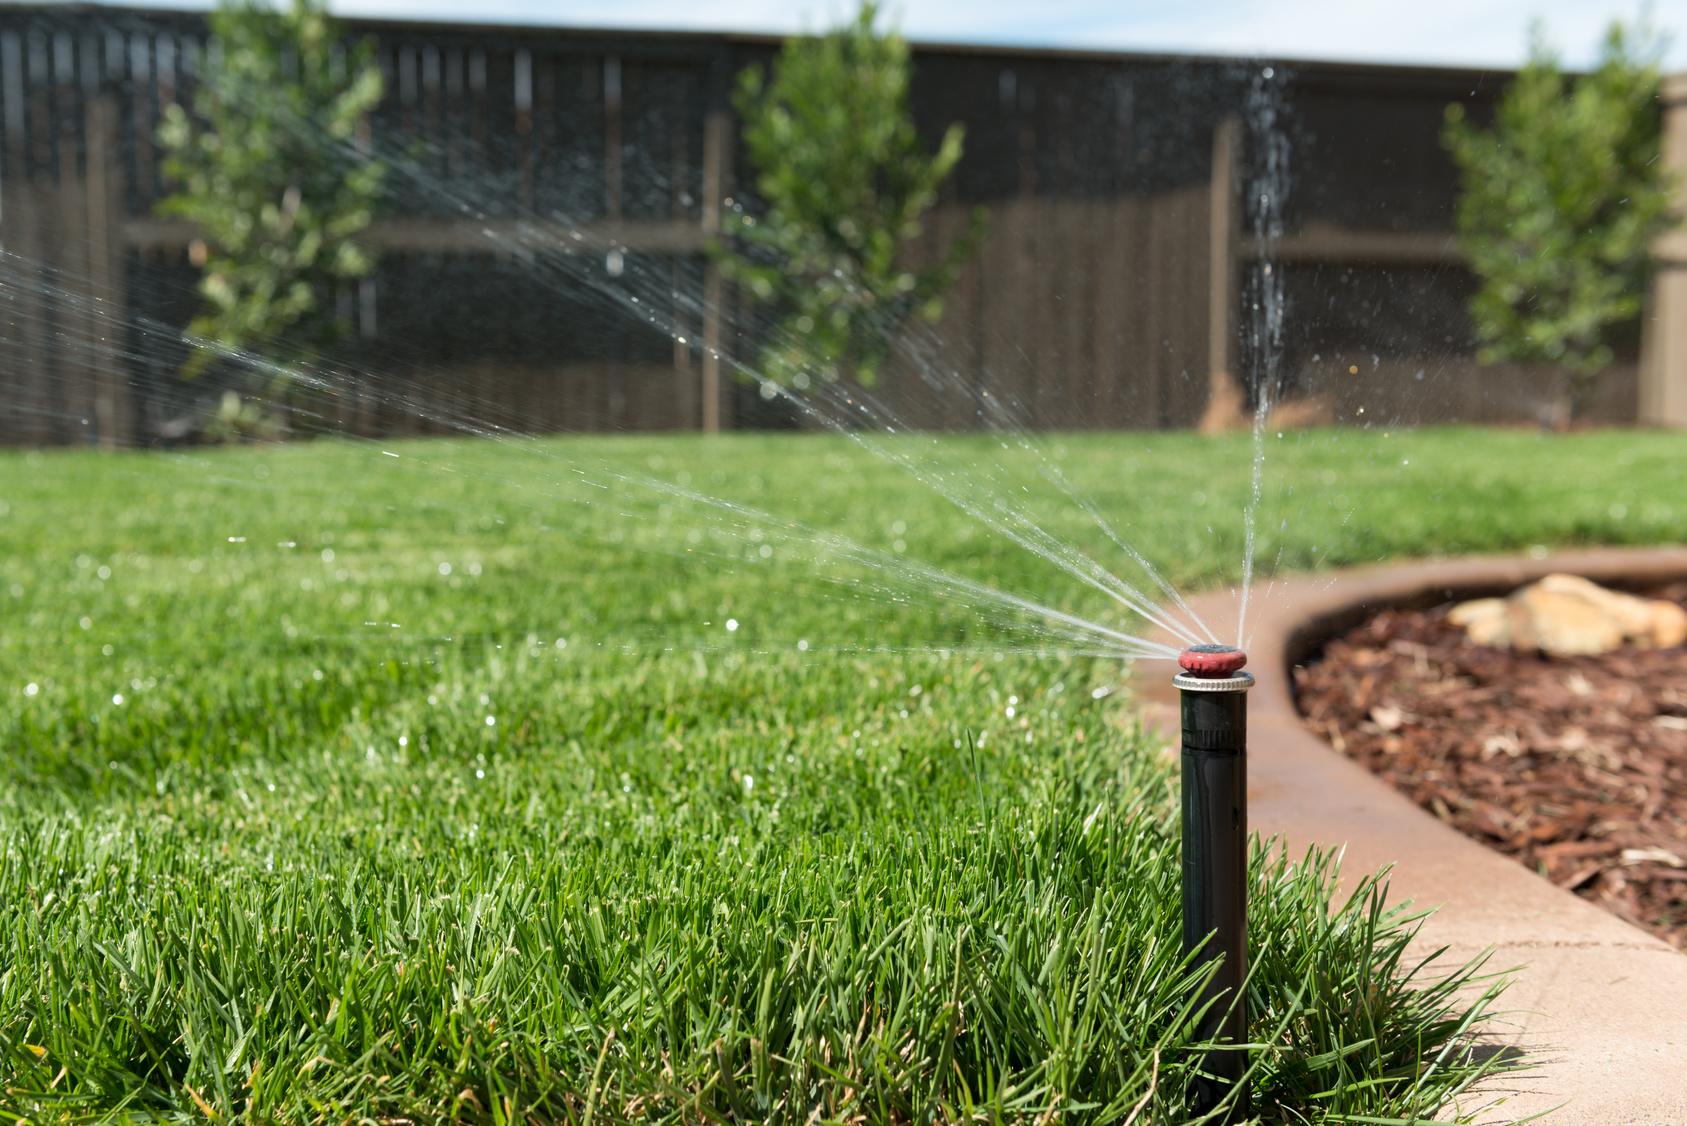 How Do Lawn Sprinkler Systems Work